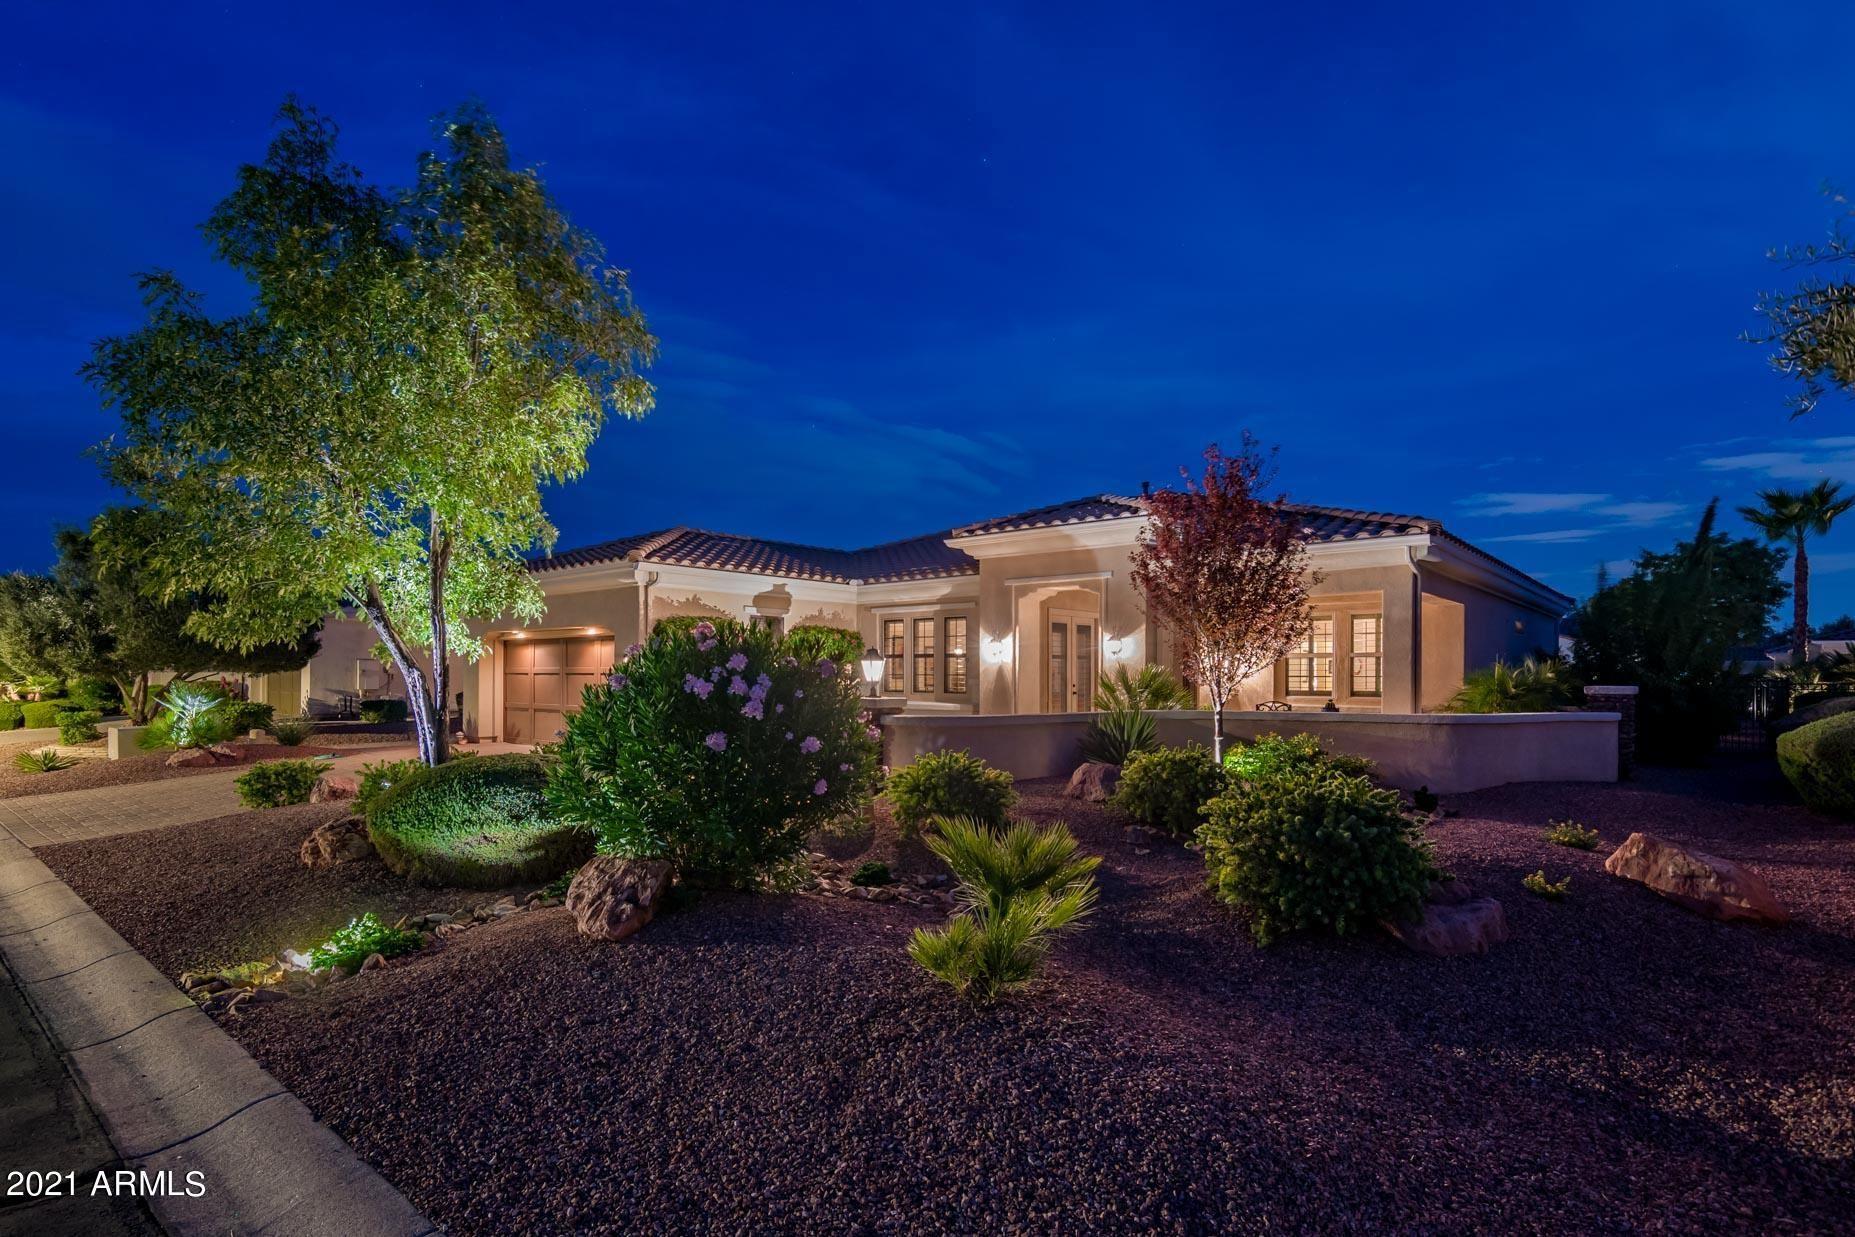 Photo of 13325 W EL SUENO Court, Sun City West, AZ 85375 (MLS # 6267468)